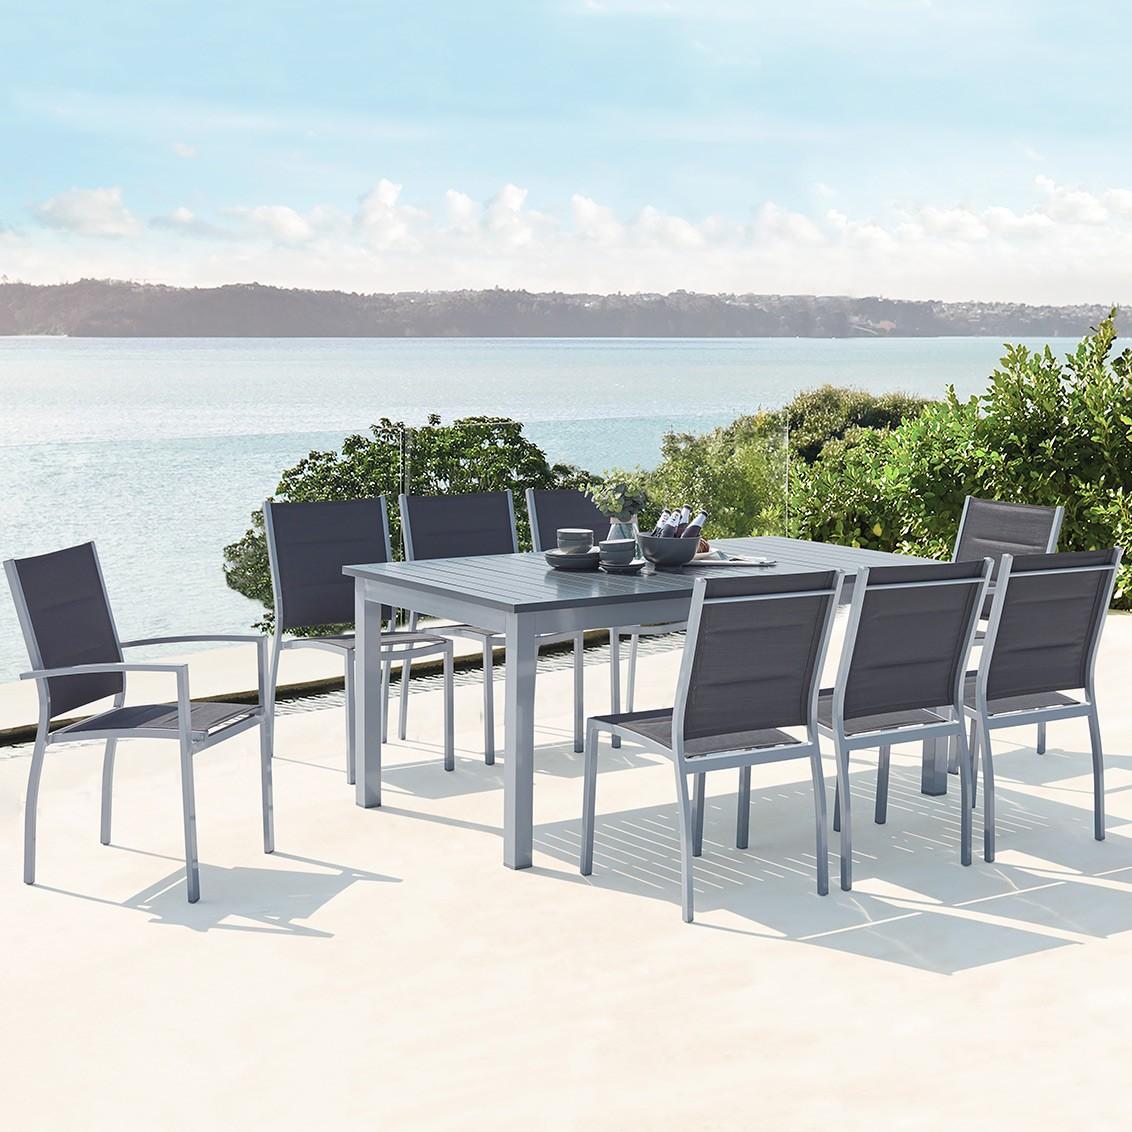 Mazzara 8 gris : salon de jardin extensible en aluminium + 8 assises ...